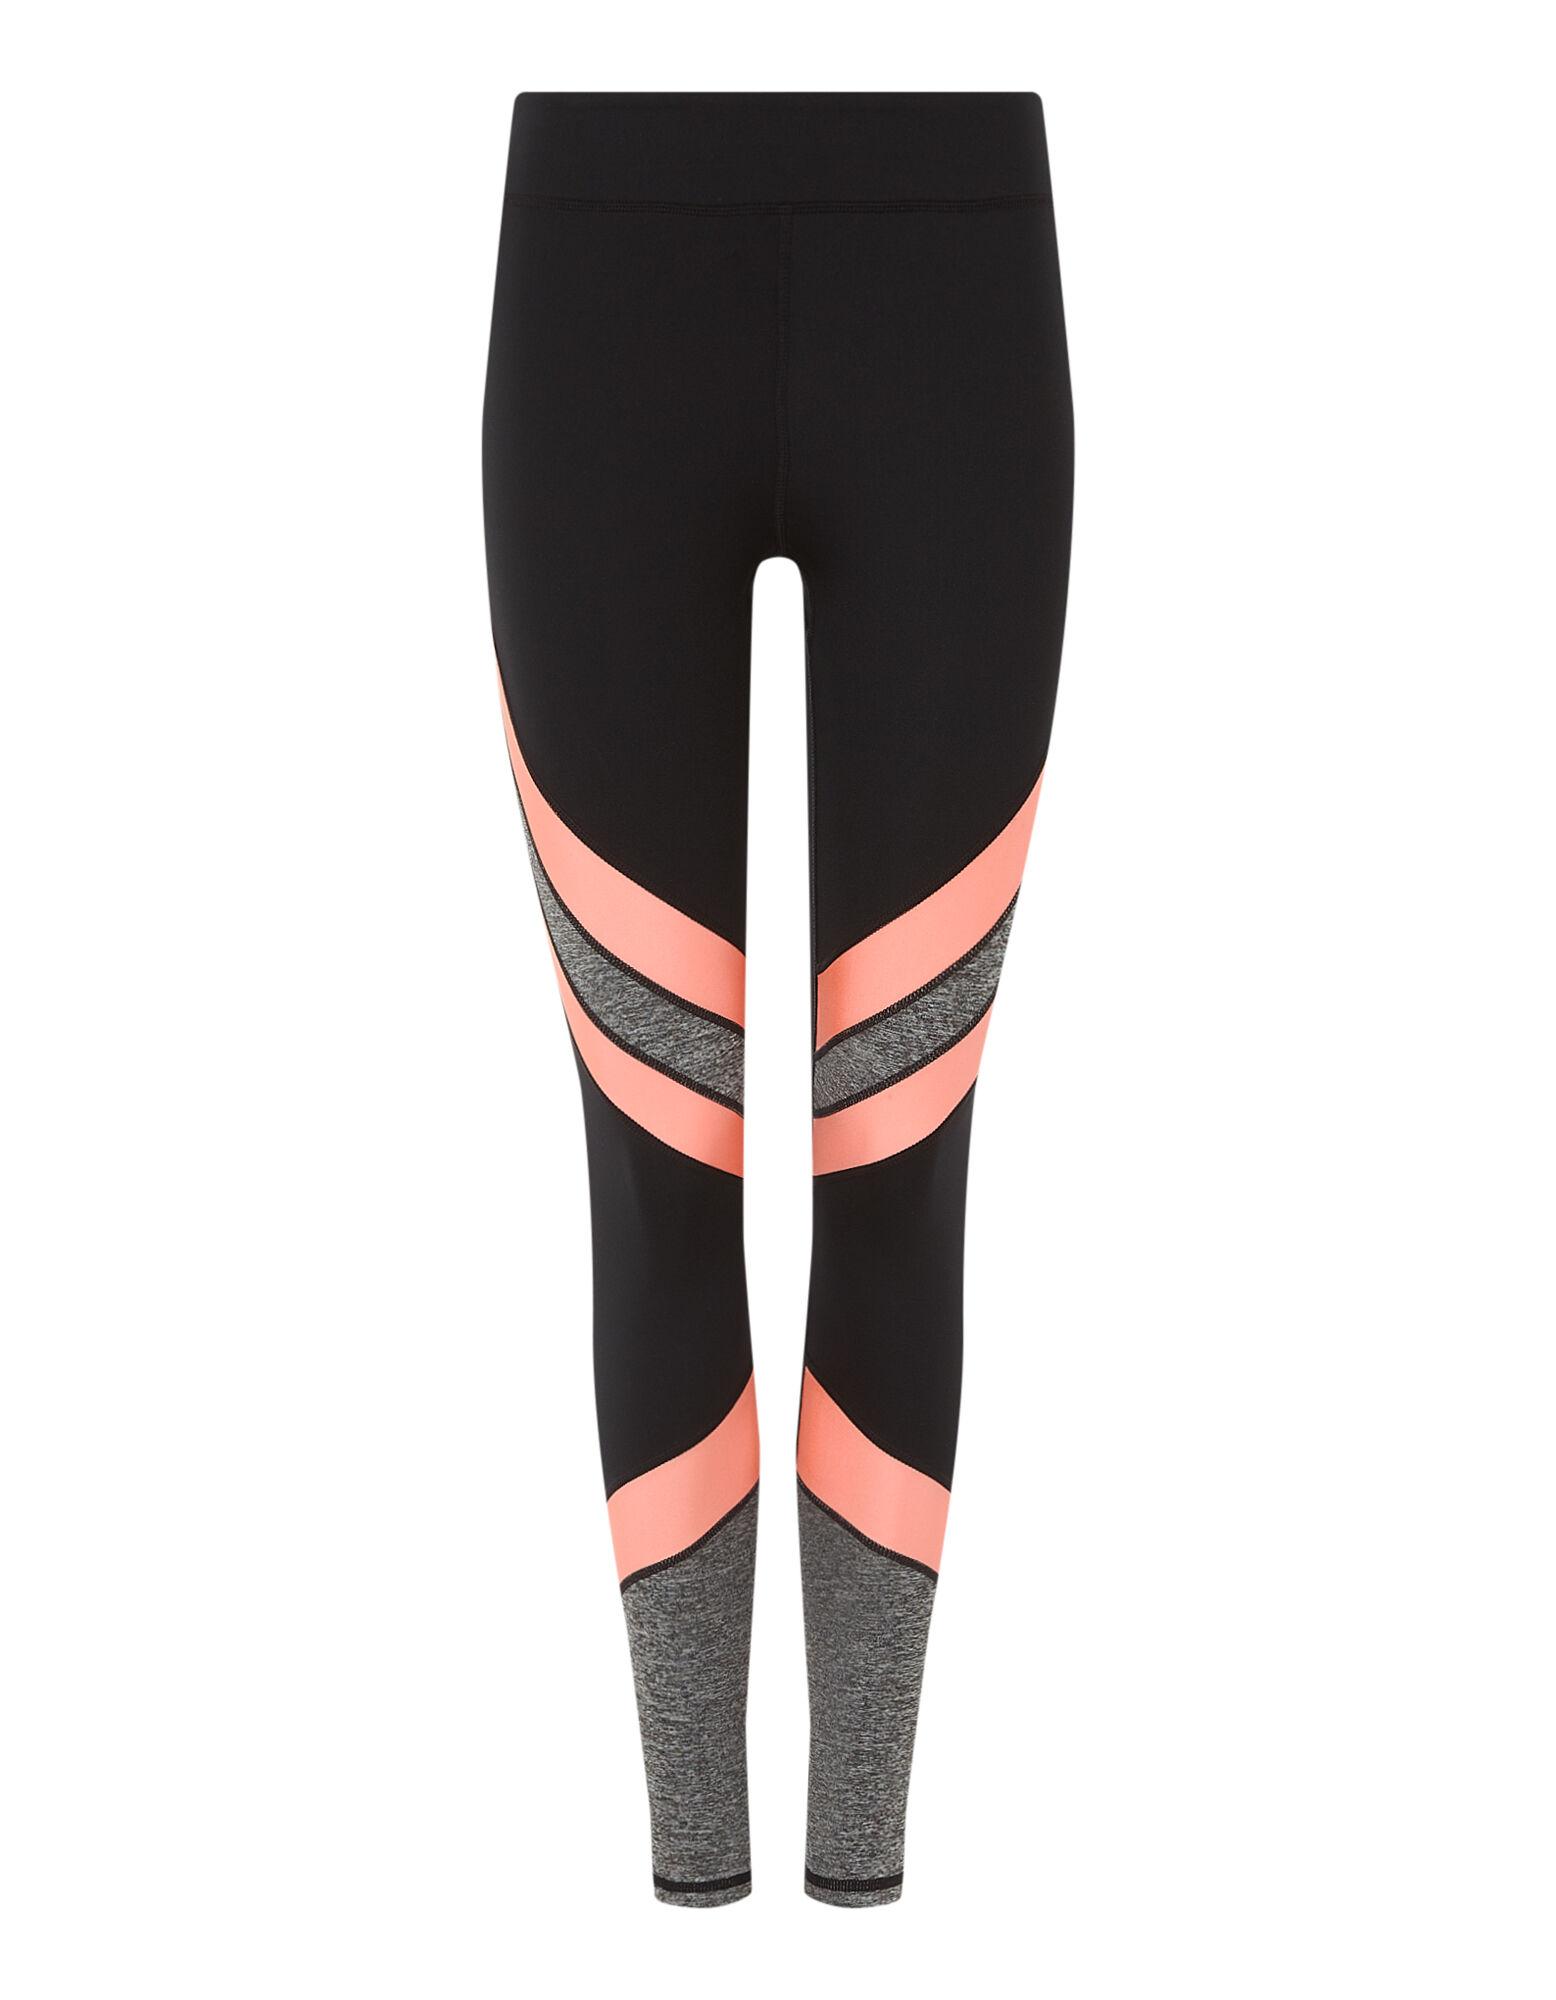 Sportbekleidung Damen Takko Fashion